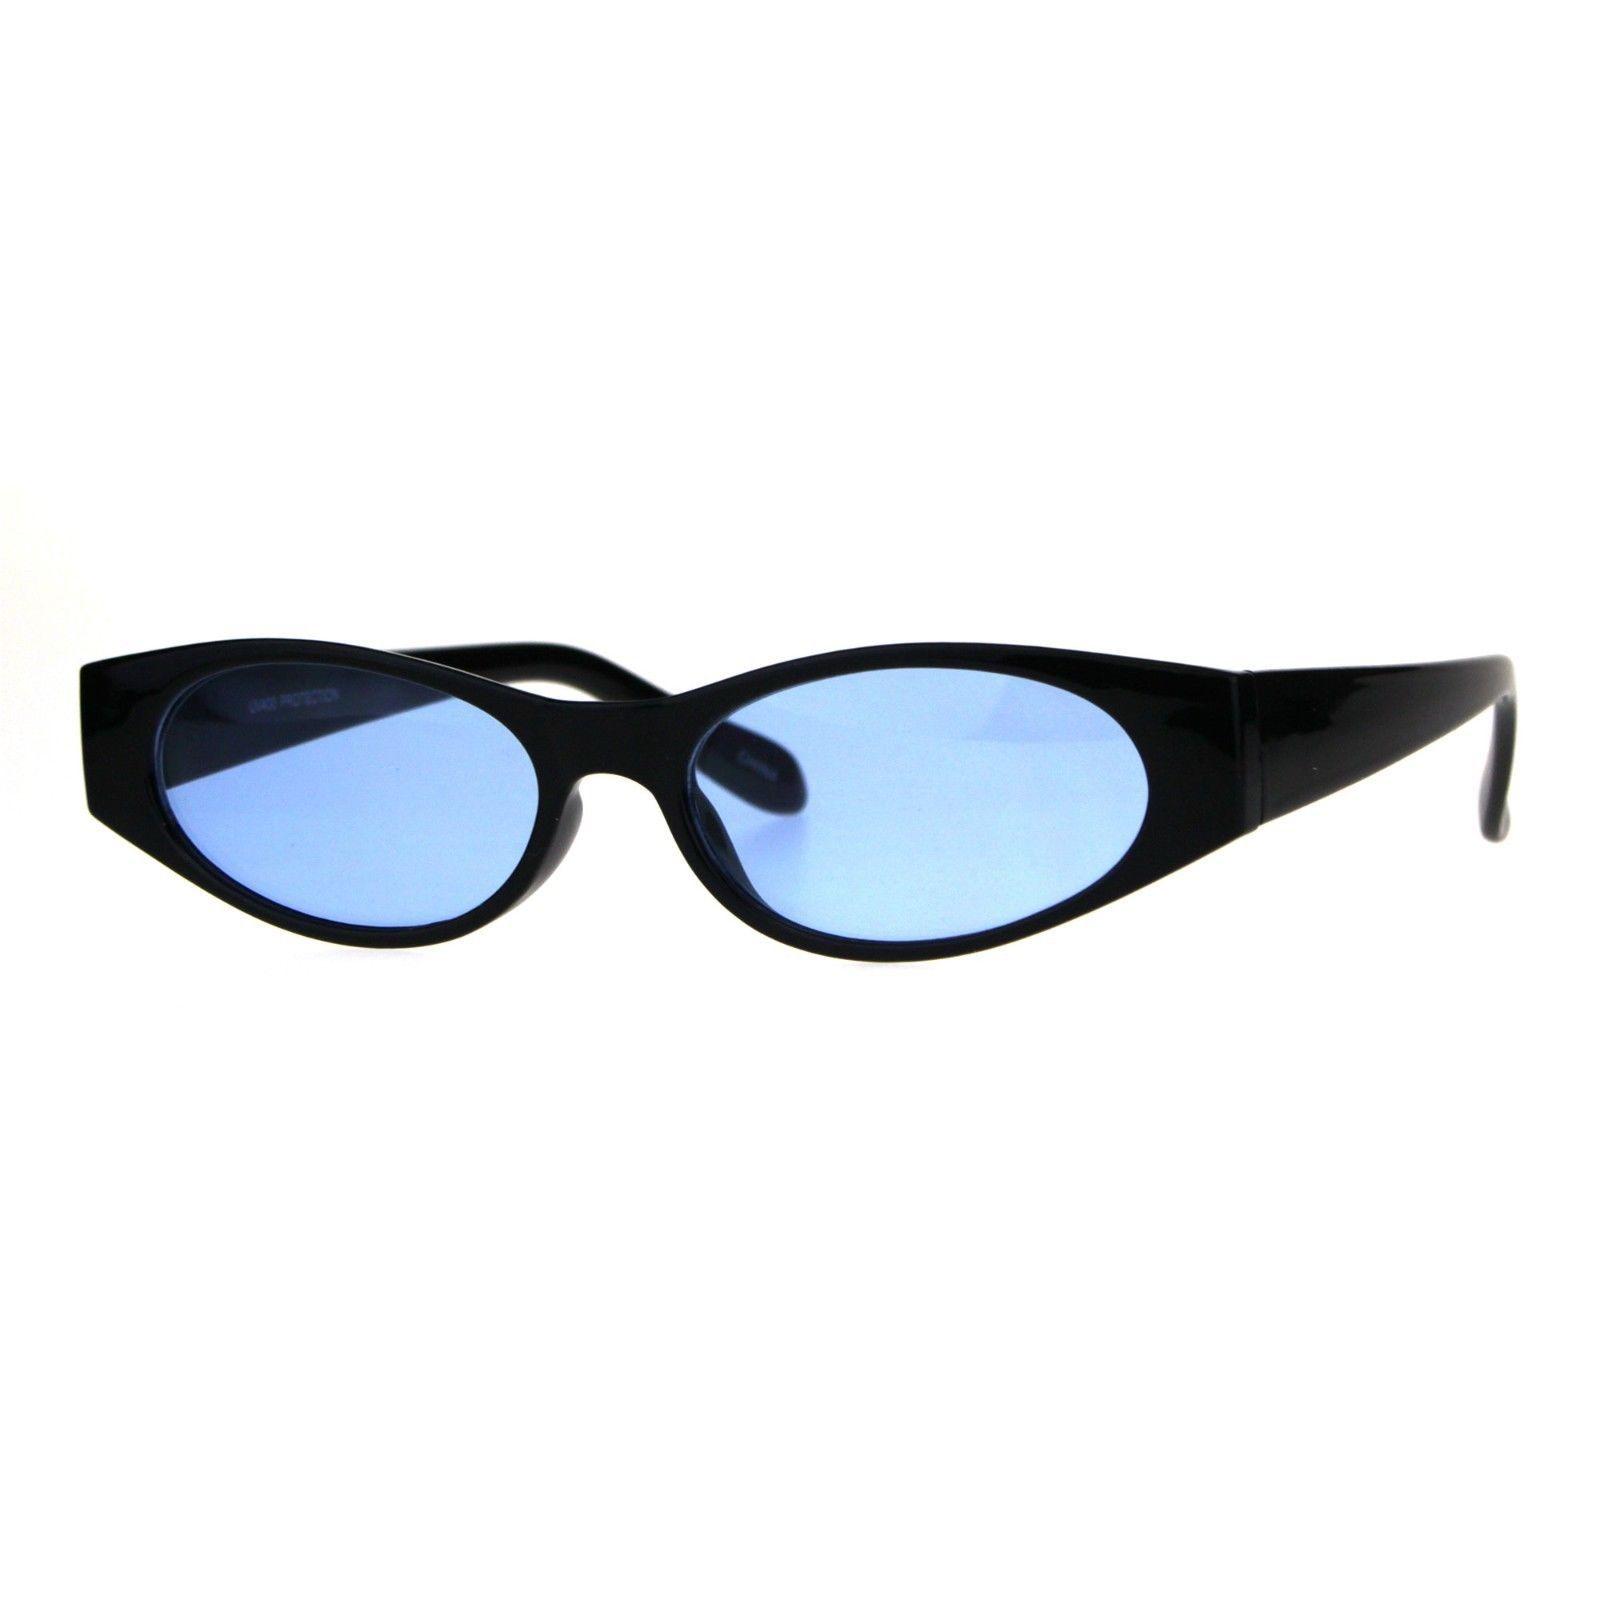 Womens Super Slim Sunglasses Black Oval Frame Modern Style Shades Color Lens